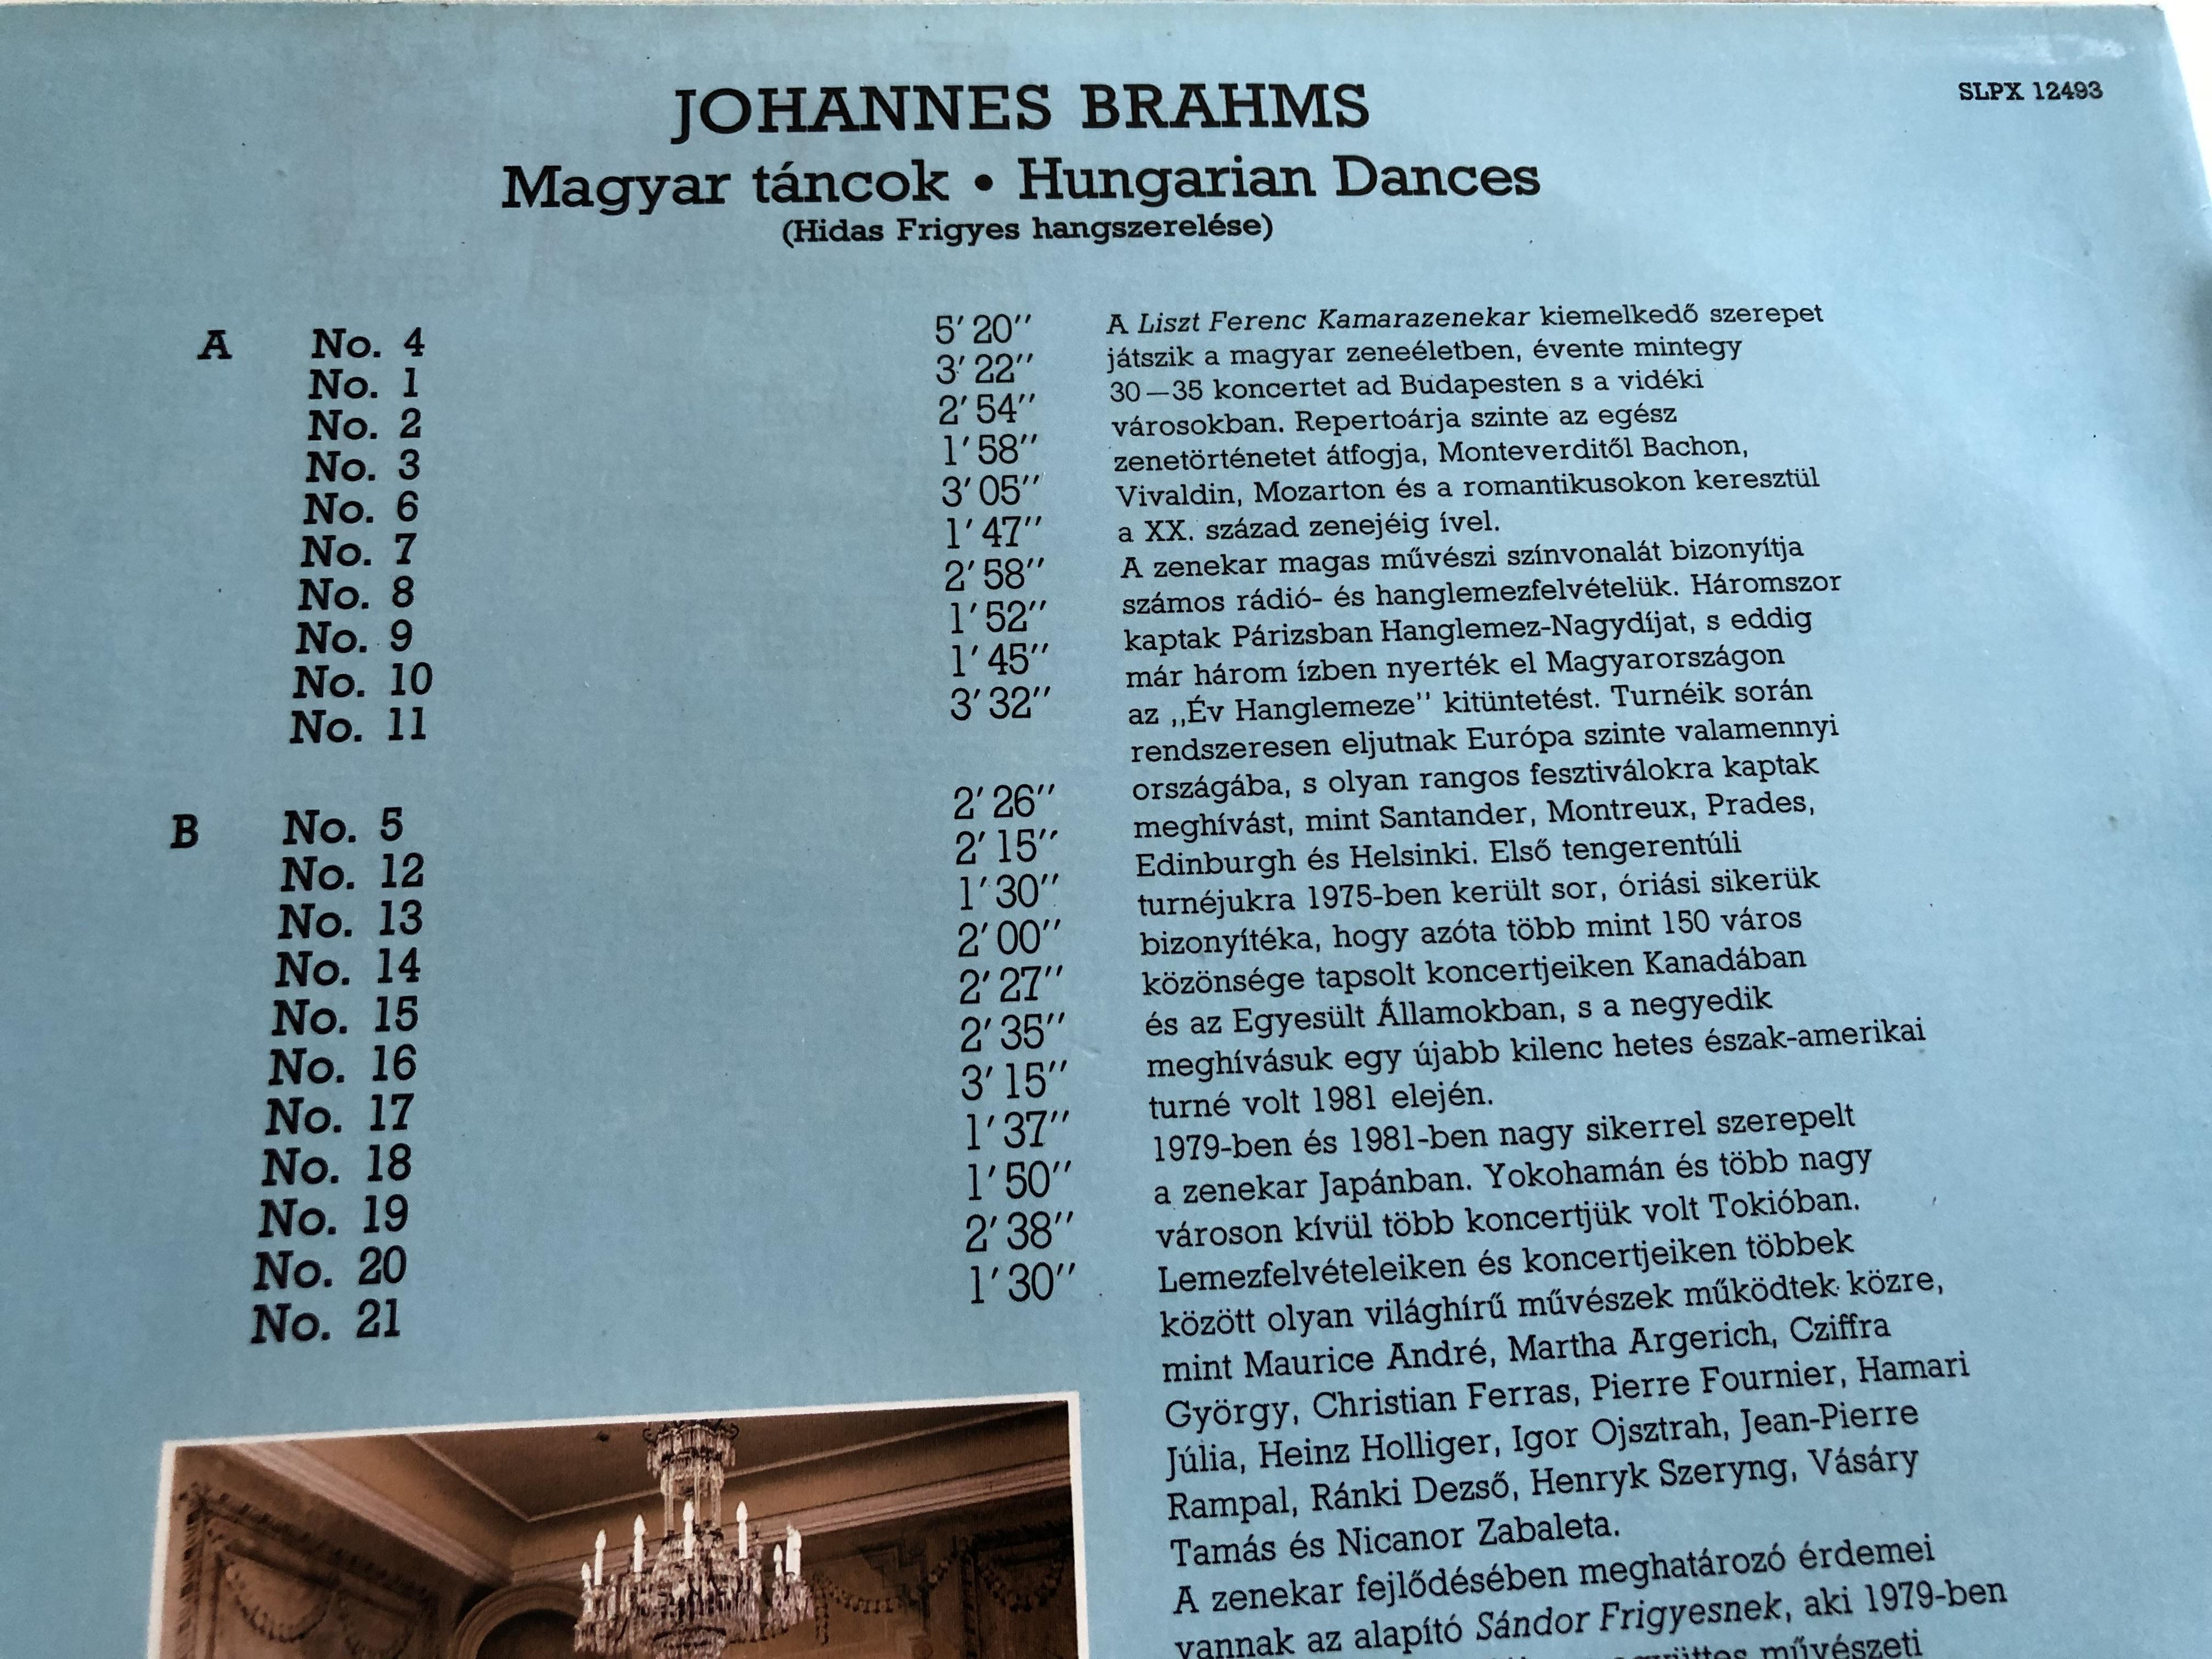 brahms-magyar-t-ncok-liszt-ferenc-kamarazenekar-rolla-j-nos-hungaroton-lp-stereo-slpx-12493-3-.jpg